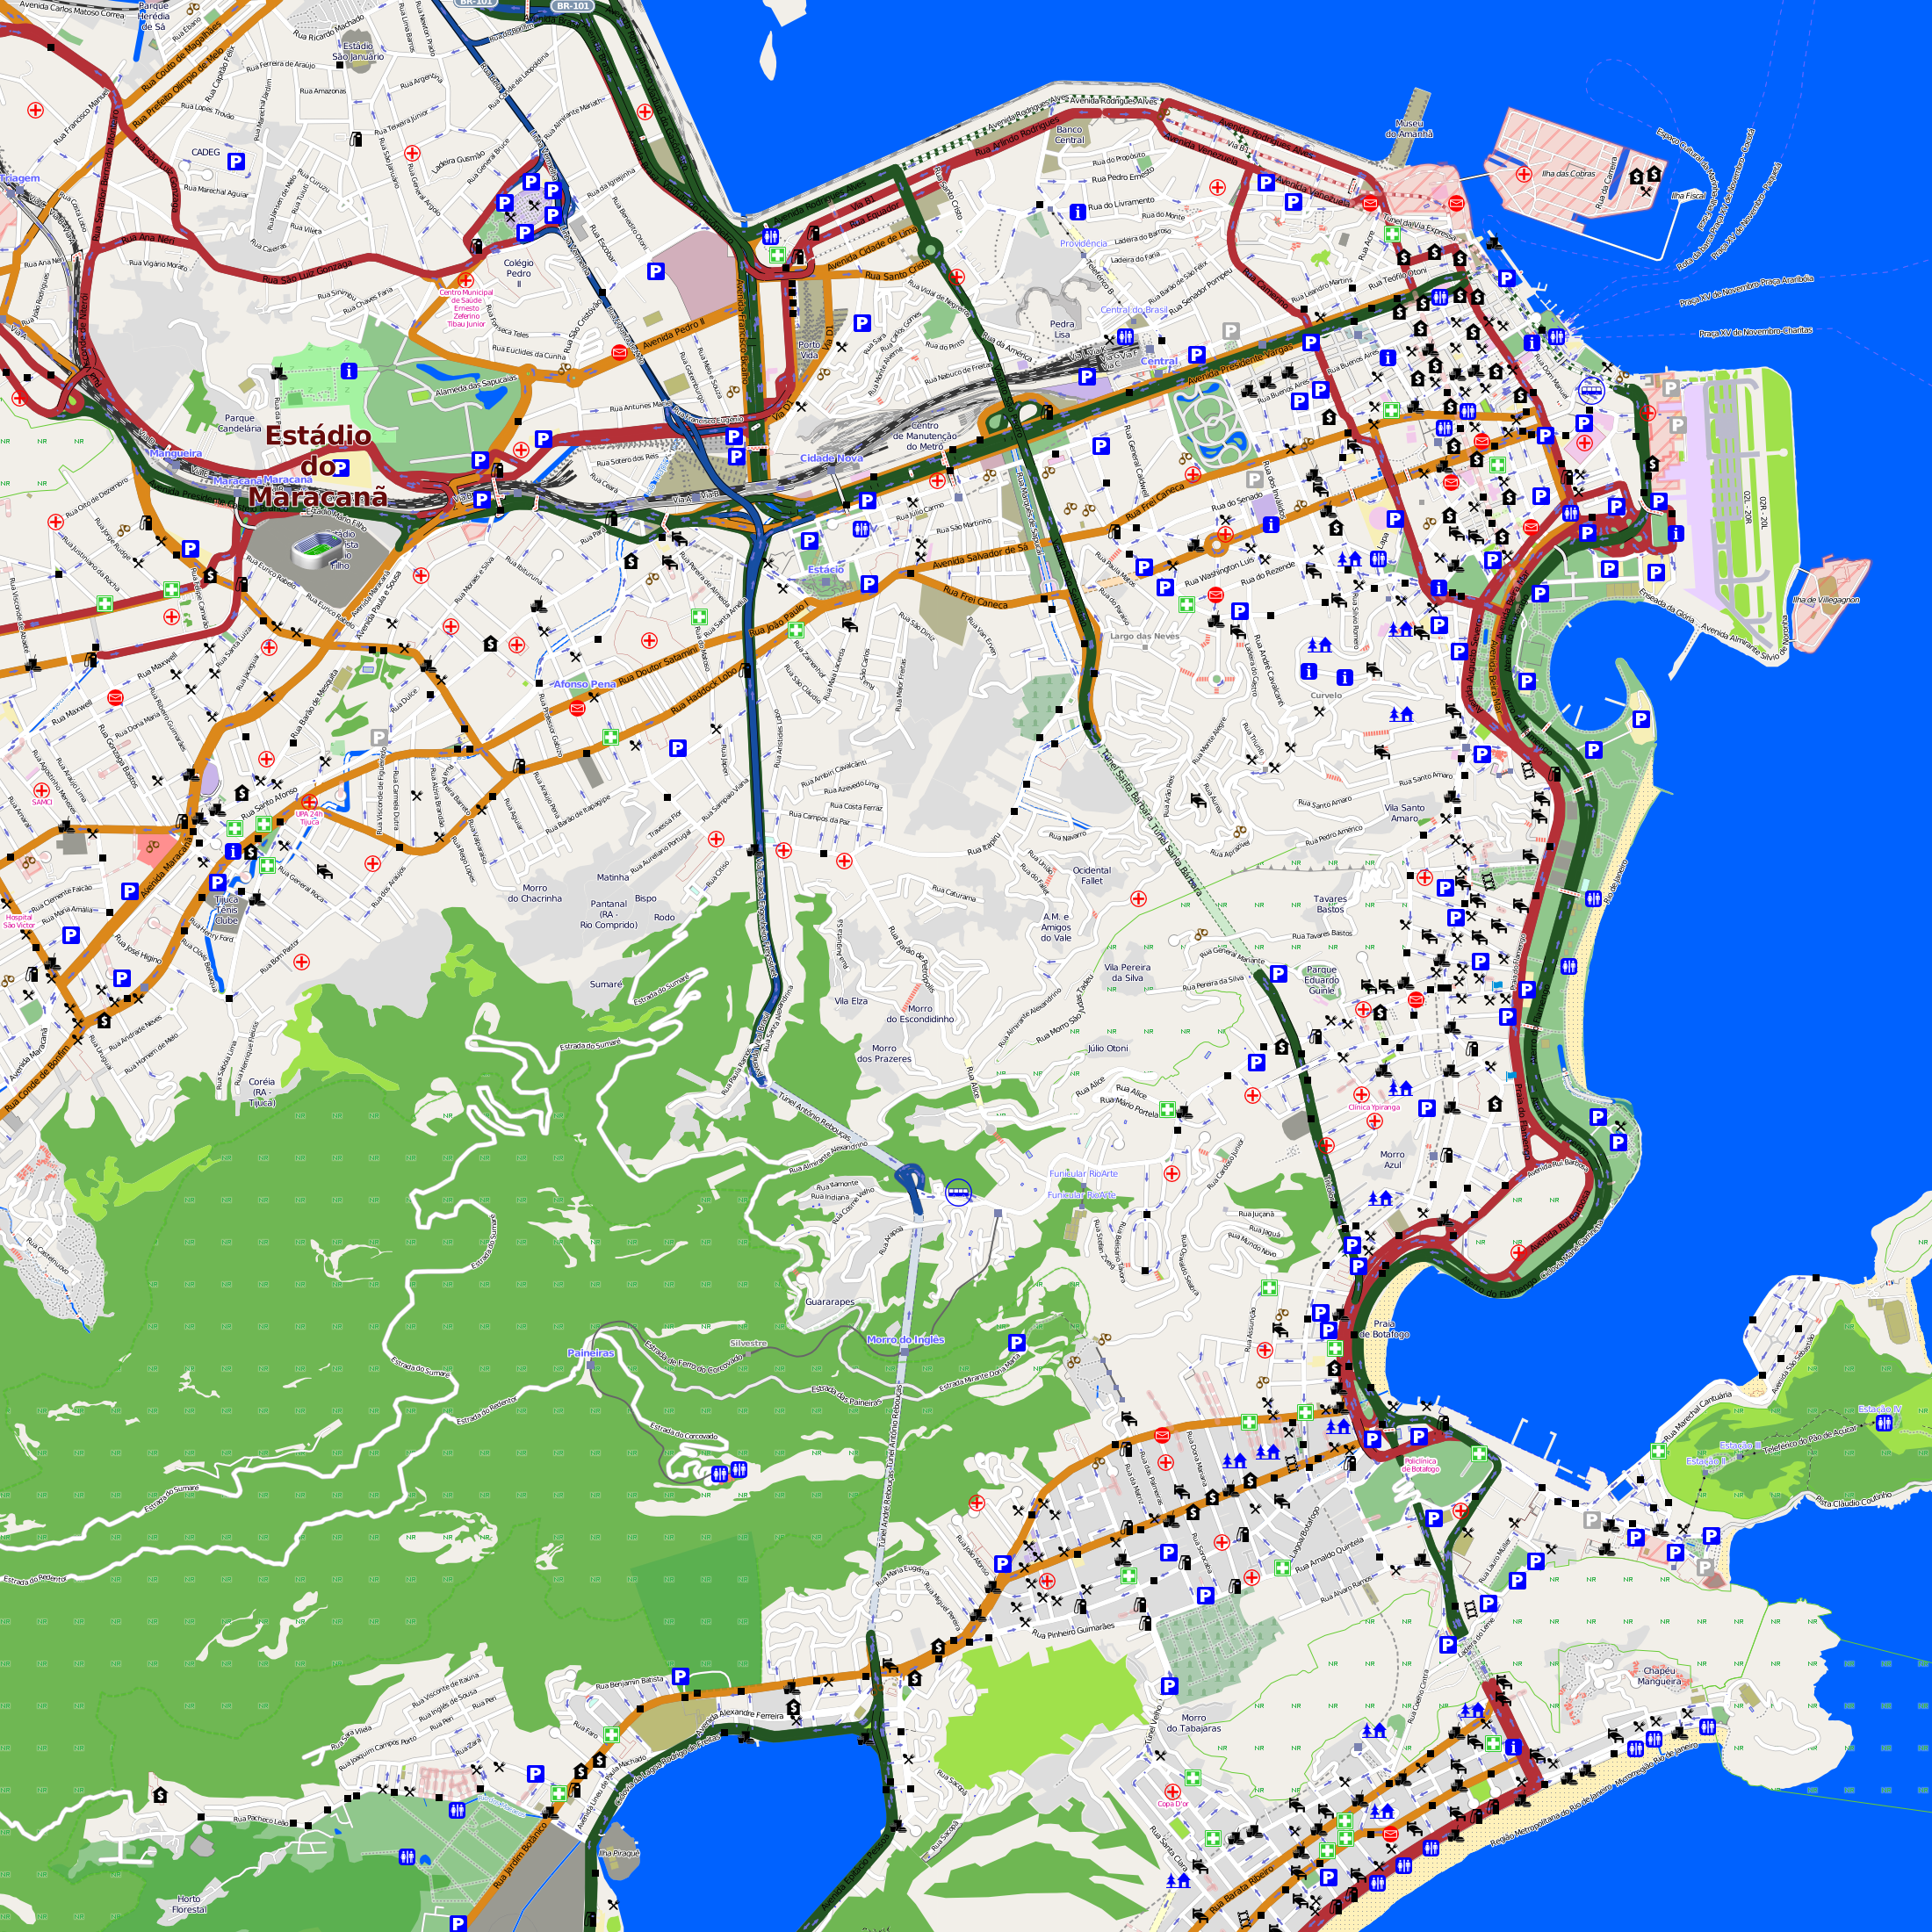 Rio De Janeiro Karte.Karten Und Stadtplane Favelas In Rio De Janeiro